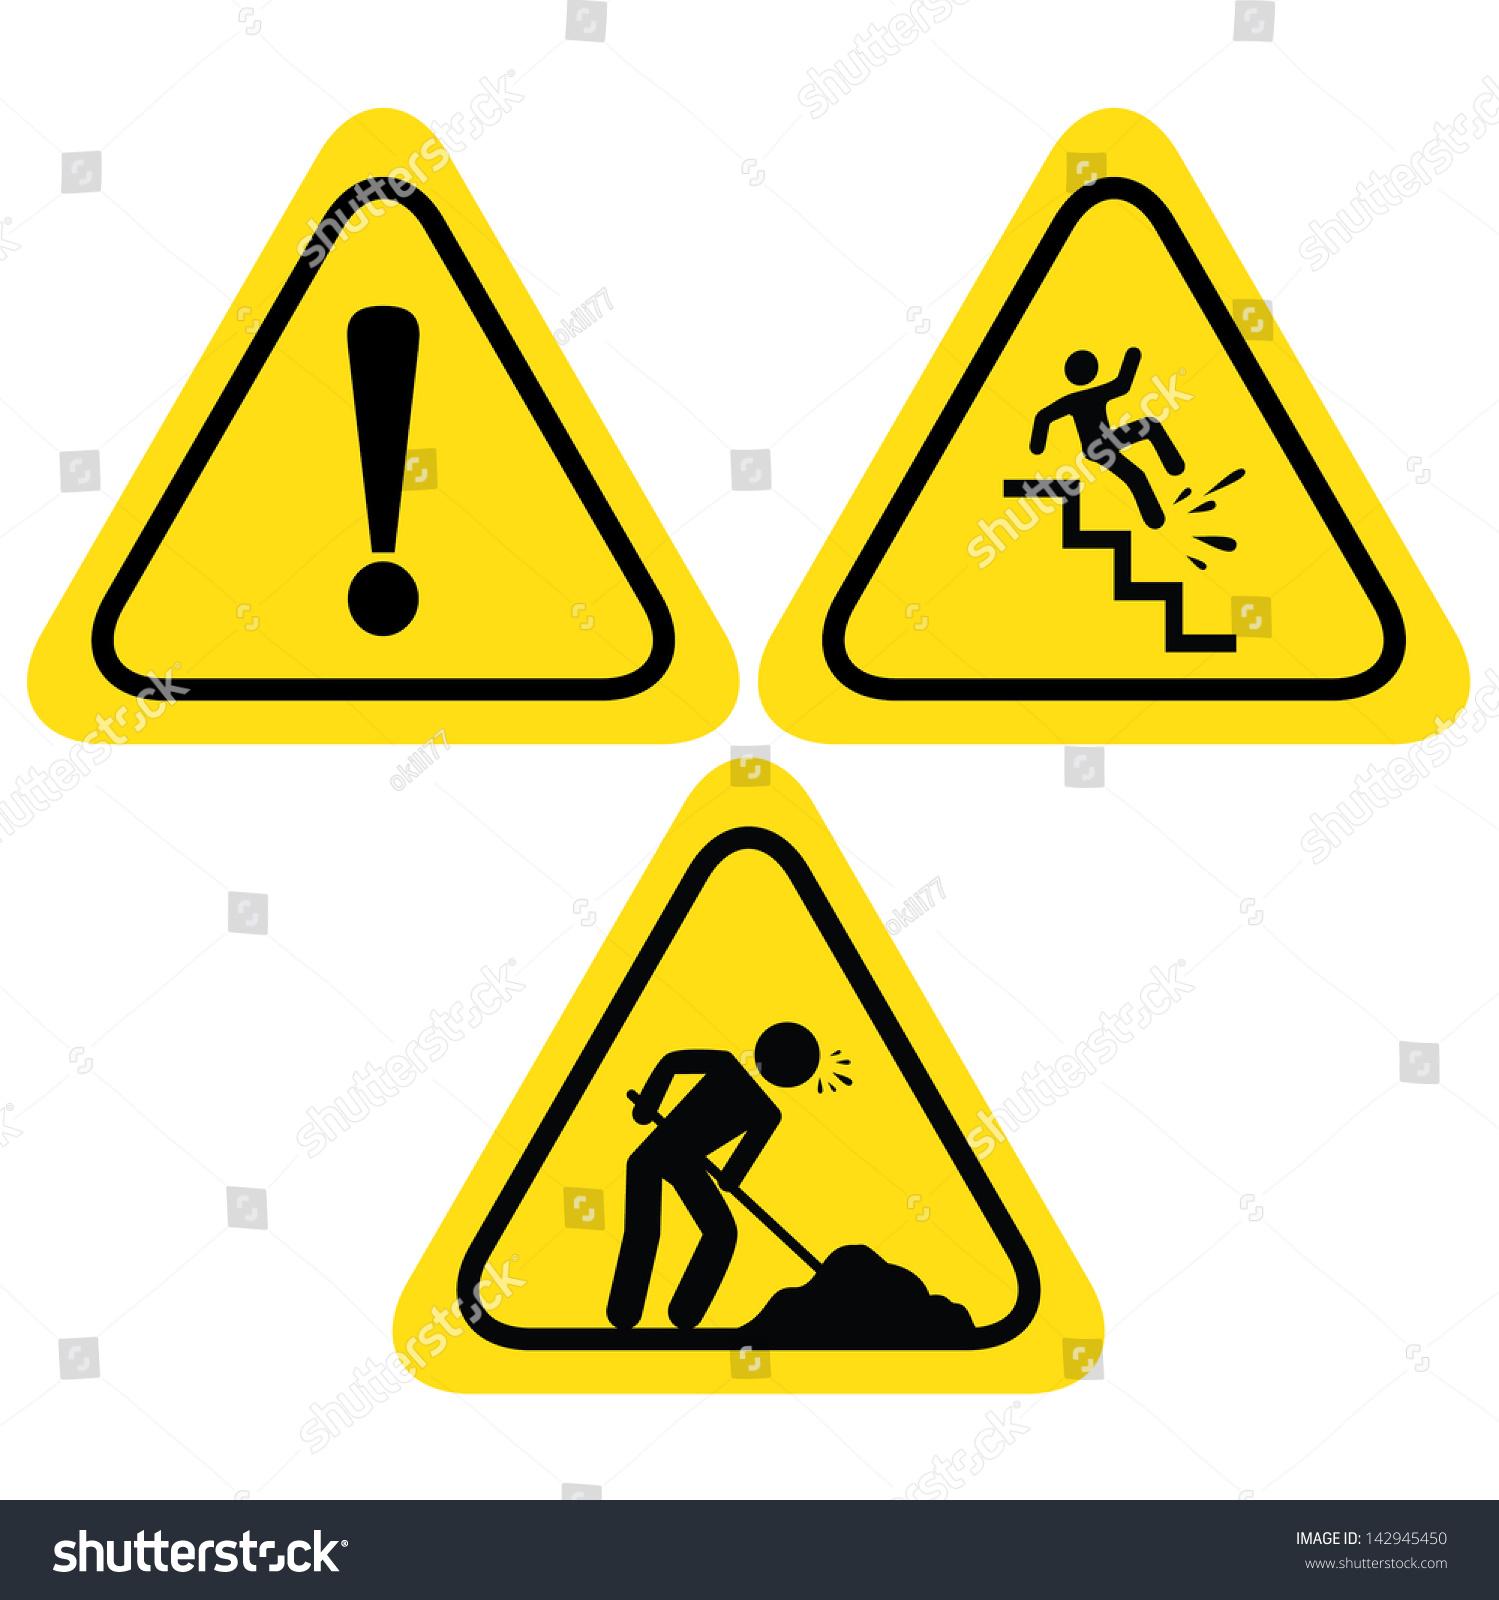 Warning Safety Signs Under Construction Road Sign Hazard